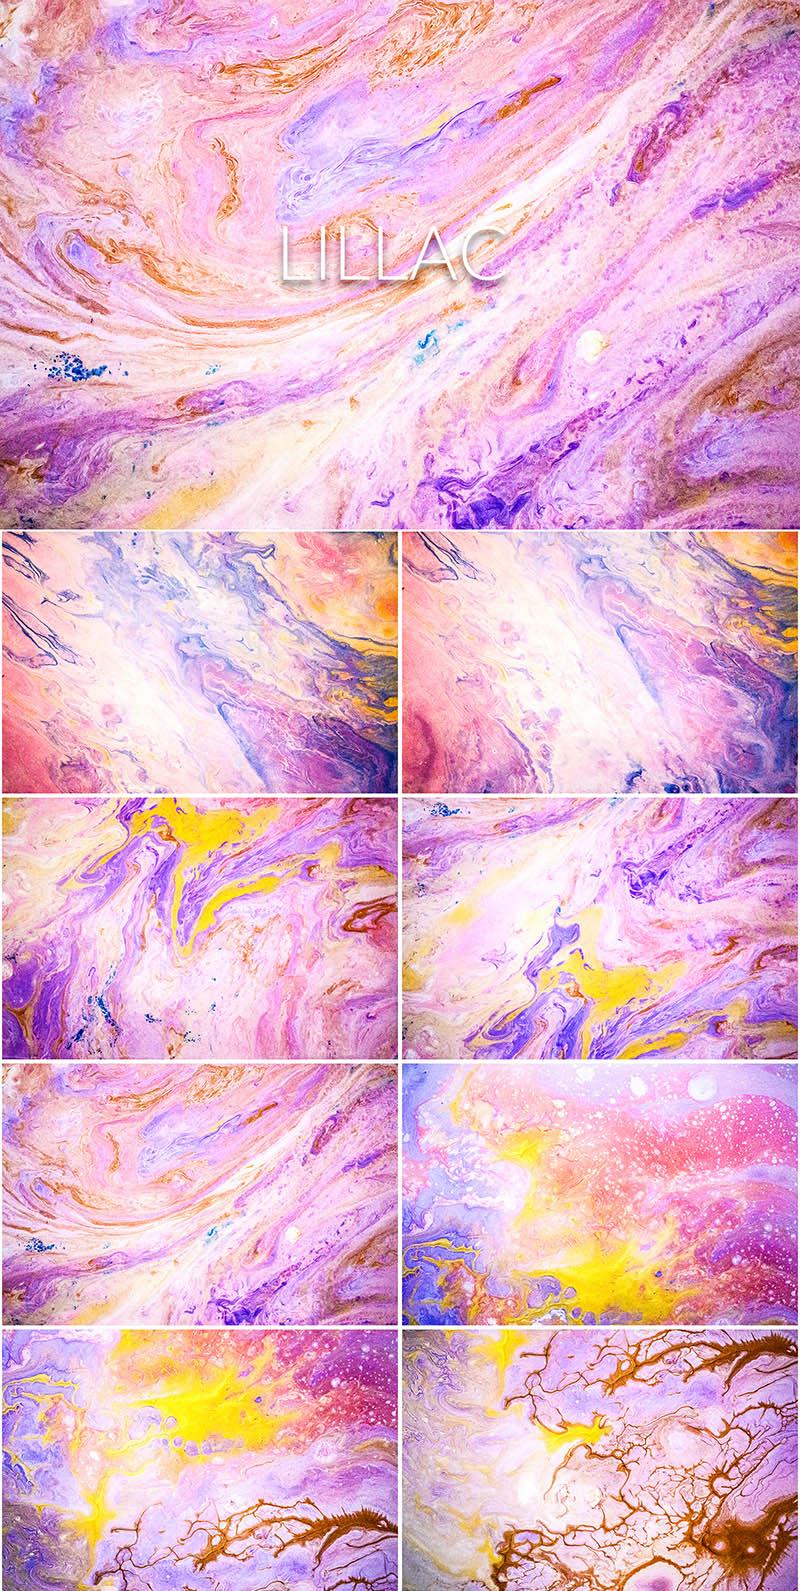 750+ Best Liquid Paint Backgrounds in 2020 - Liquid Paint Lillac PREVIEW min